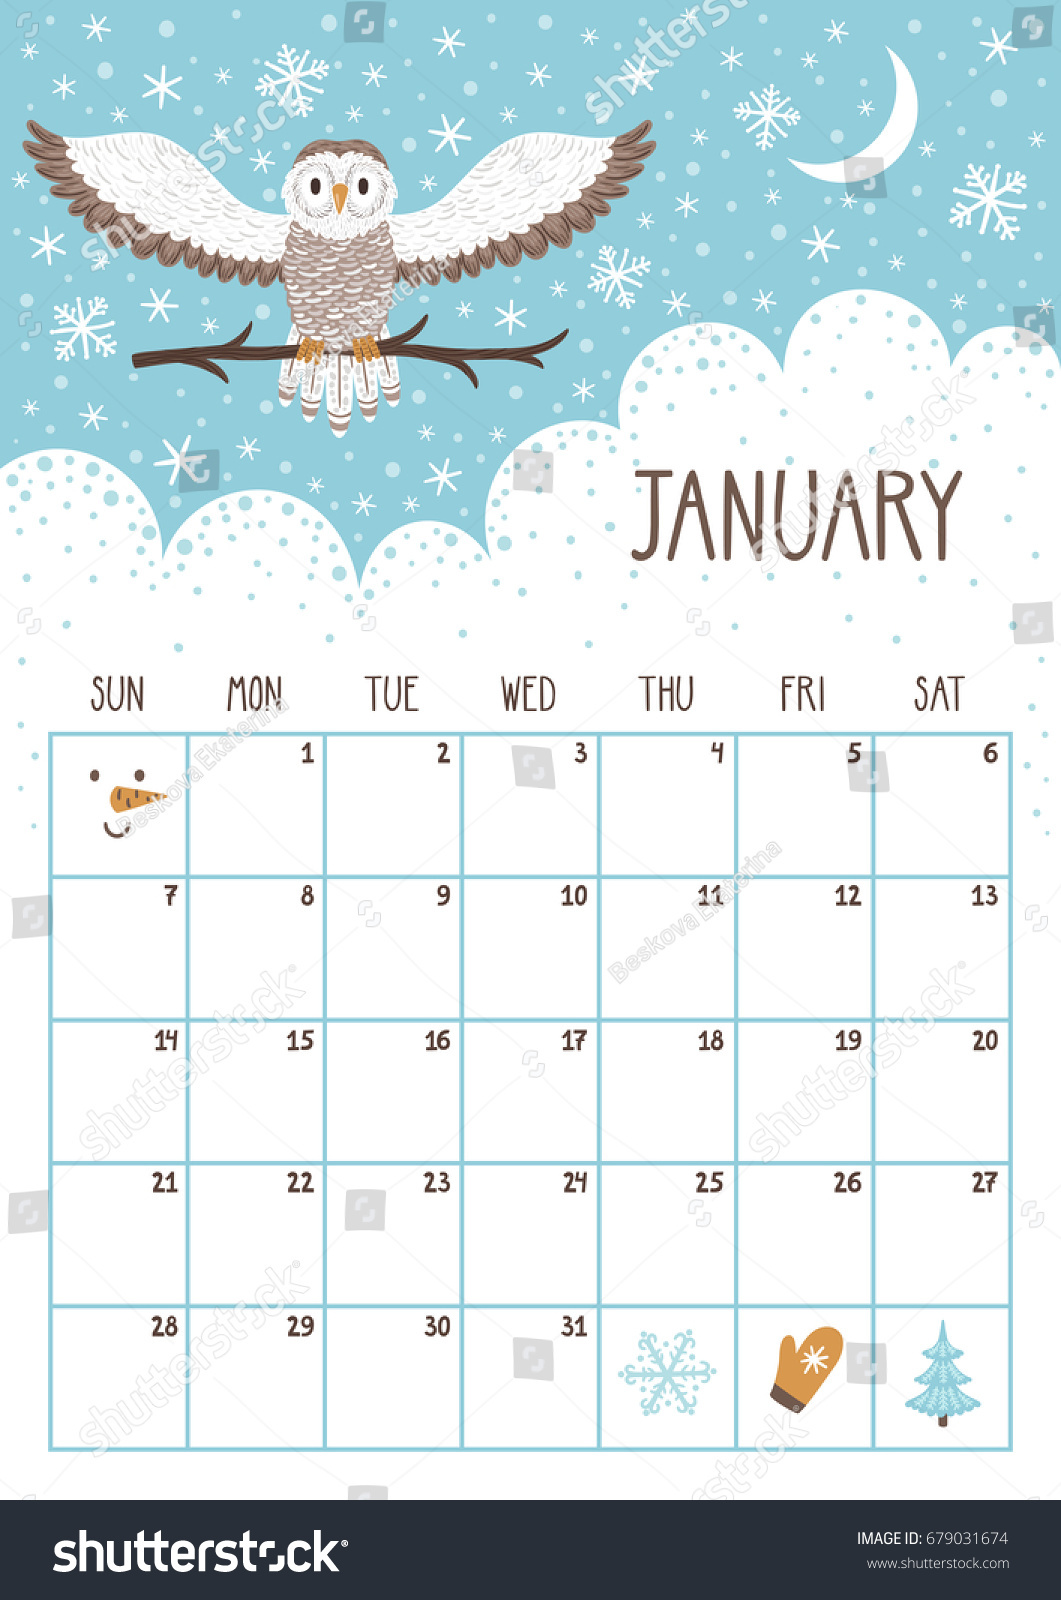 Planner Calendar Notebook Free Download : Vector monthly calendar cute owl january stock